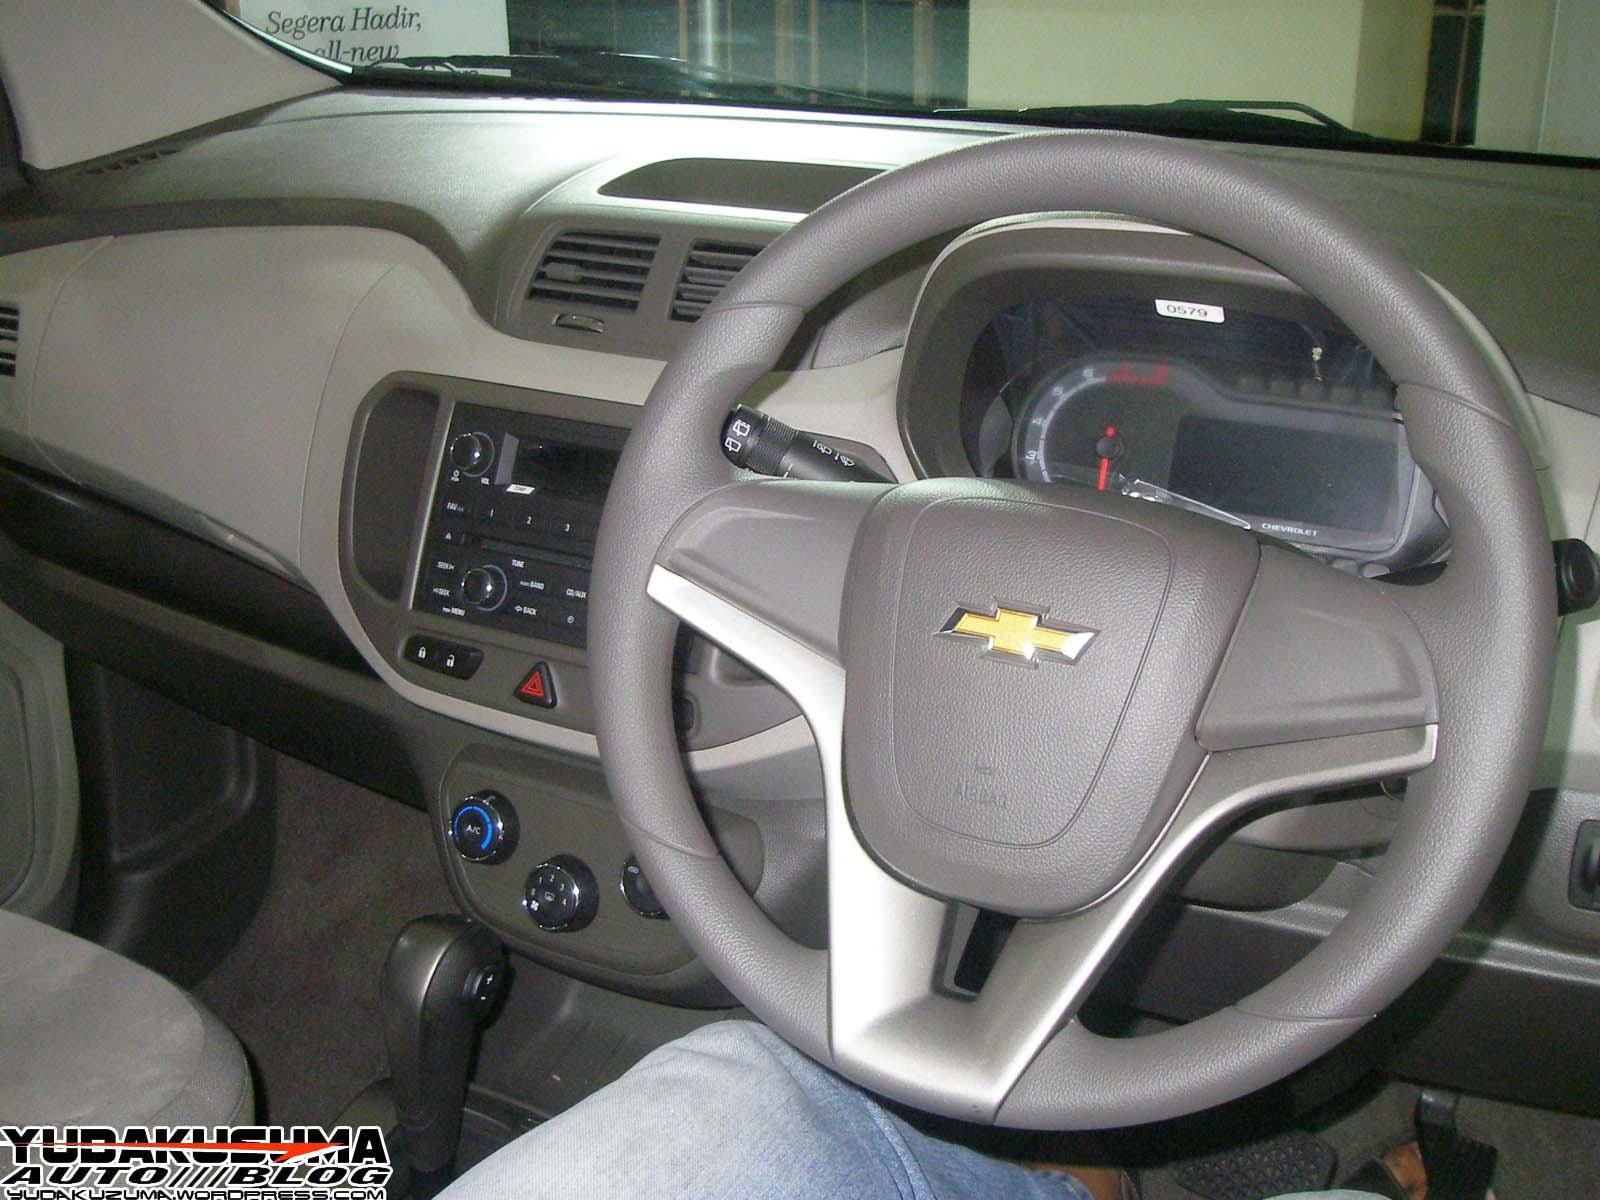 Gambar Modifikasi Mobil Chevrolet Spin